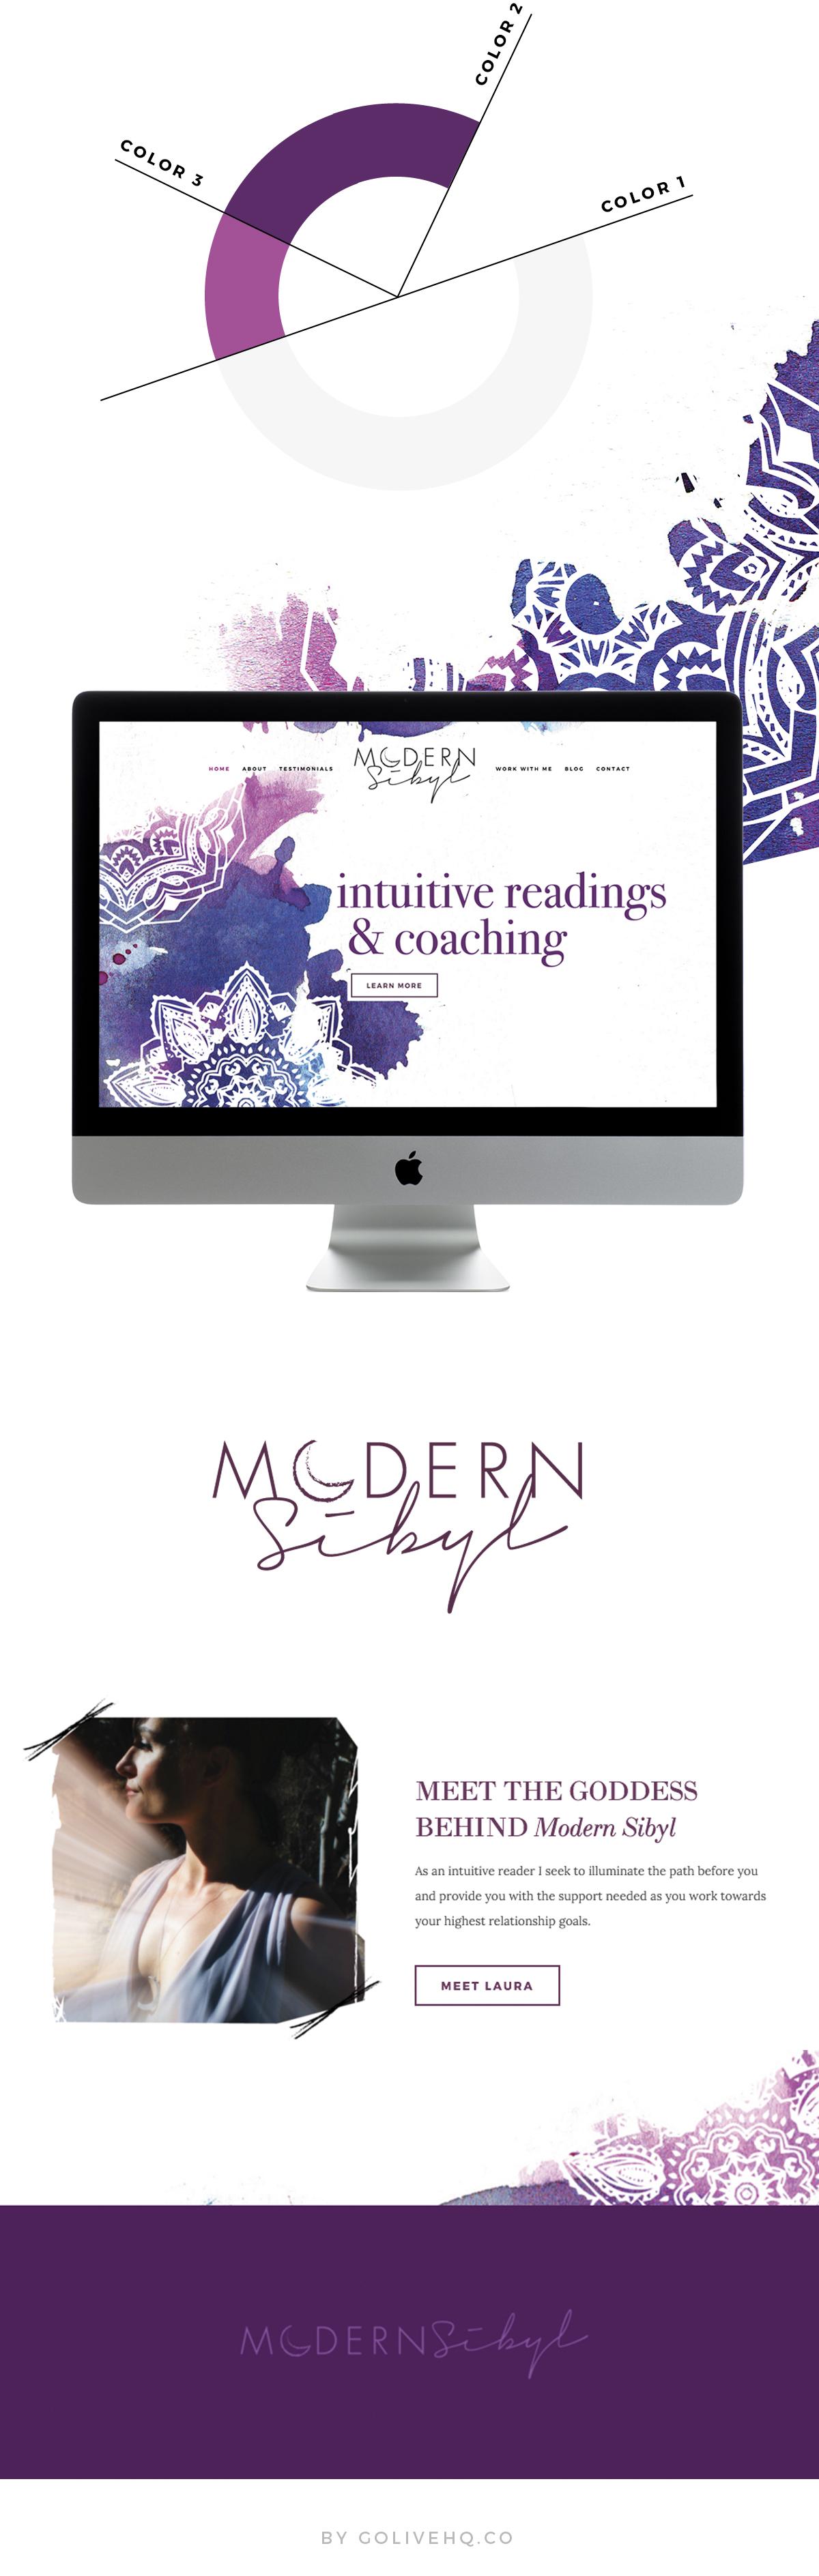 modern bohemian Squarespace website design | by: Go Live HQ